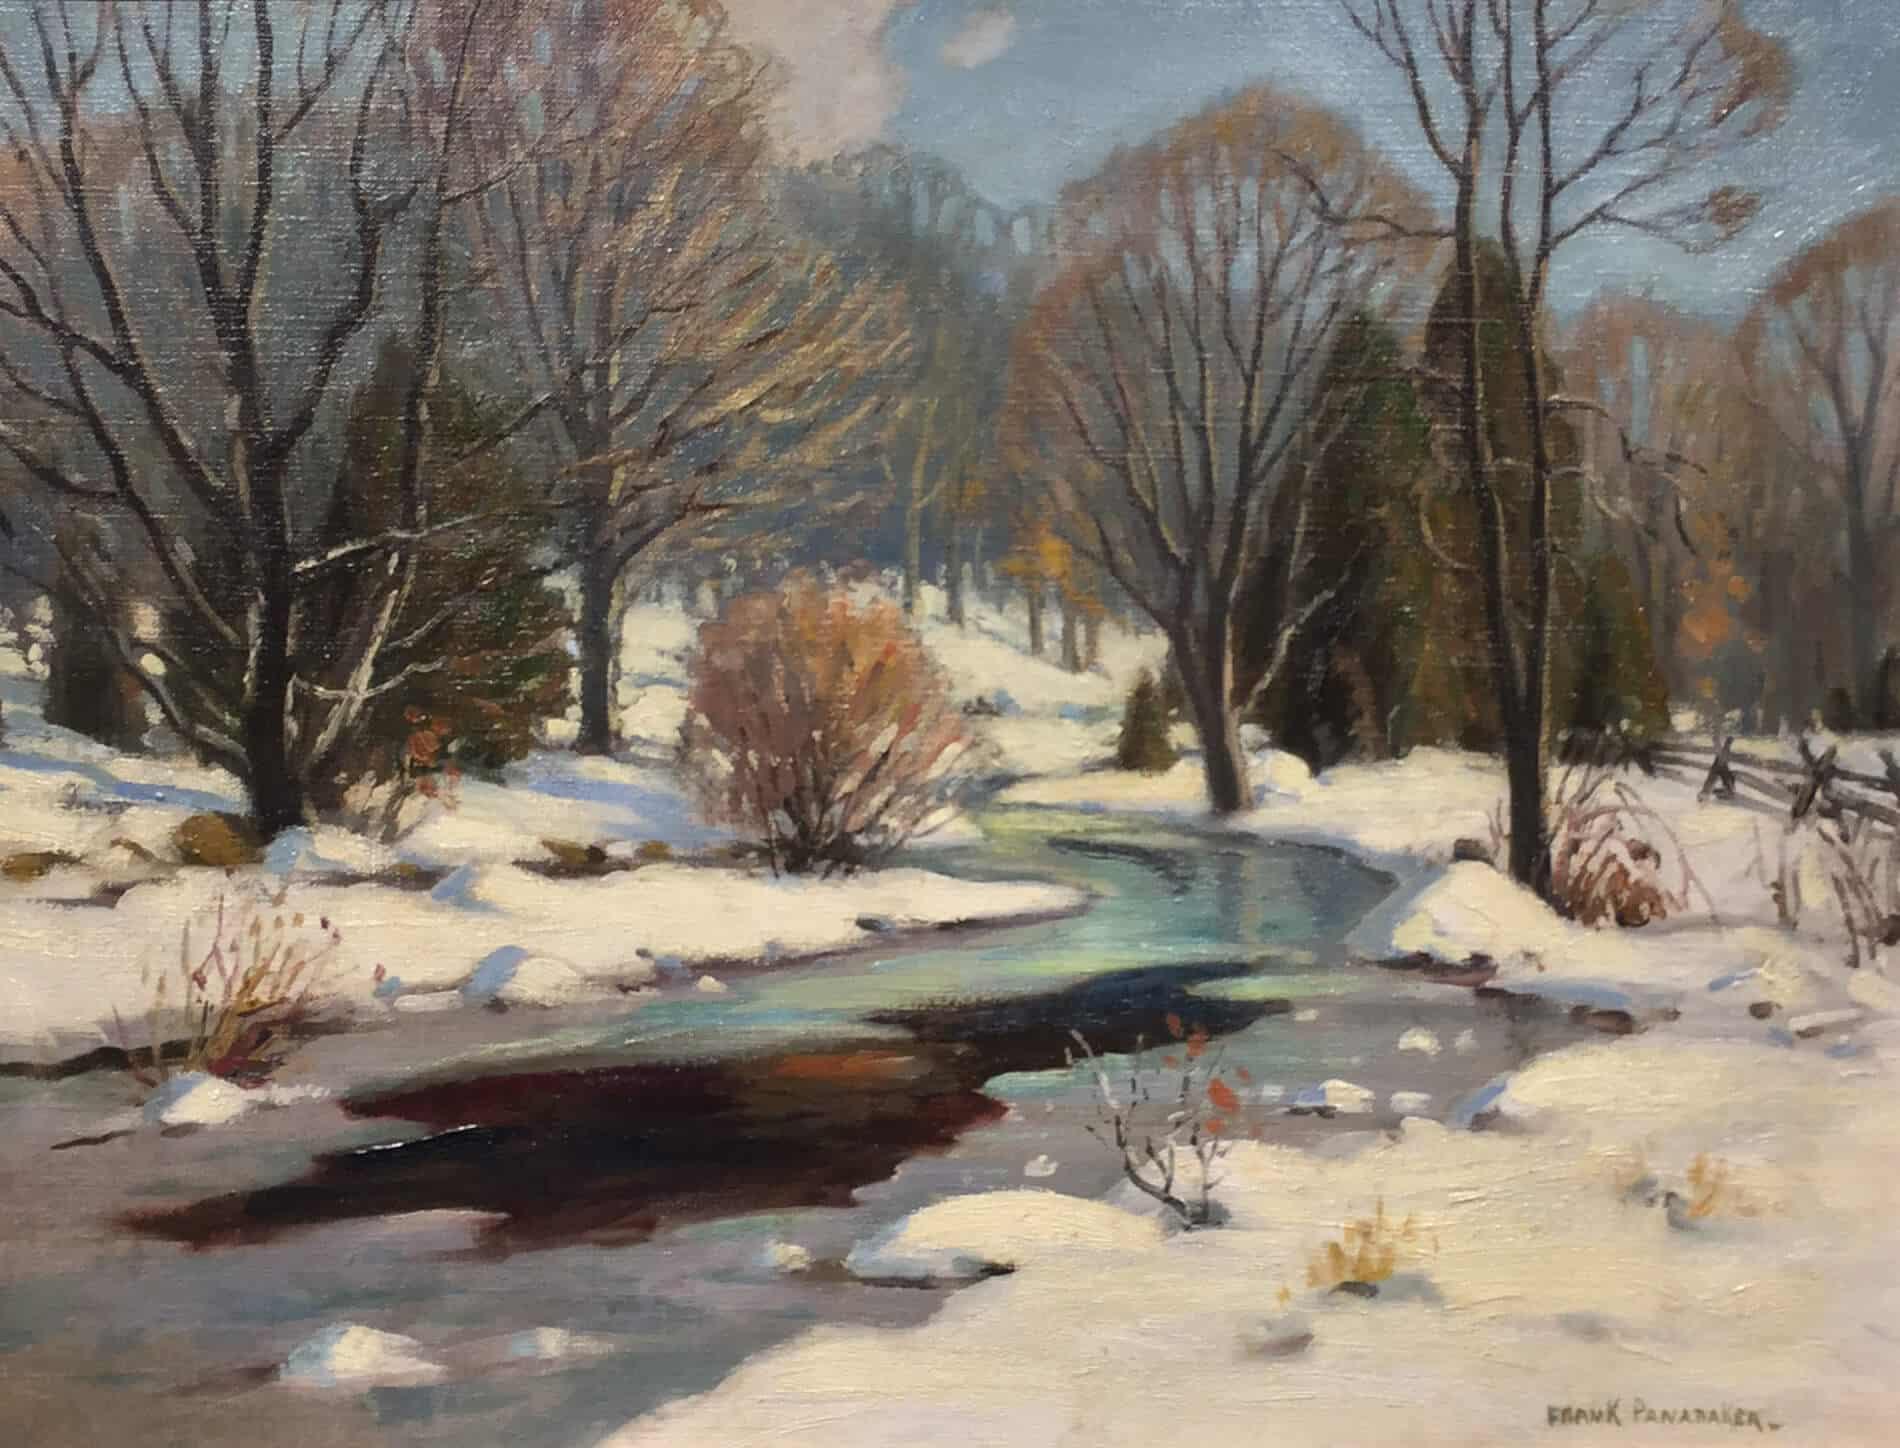 Frank Panabaker Onario Snowy River 16x20